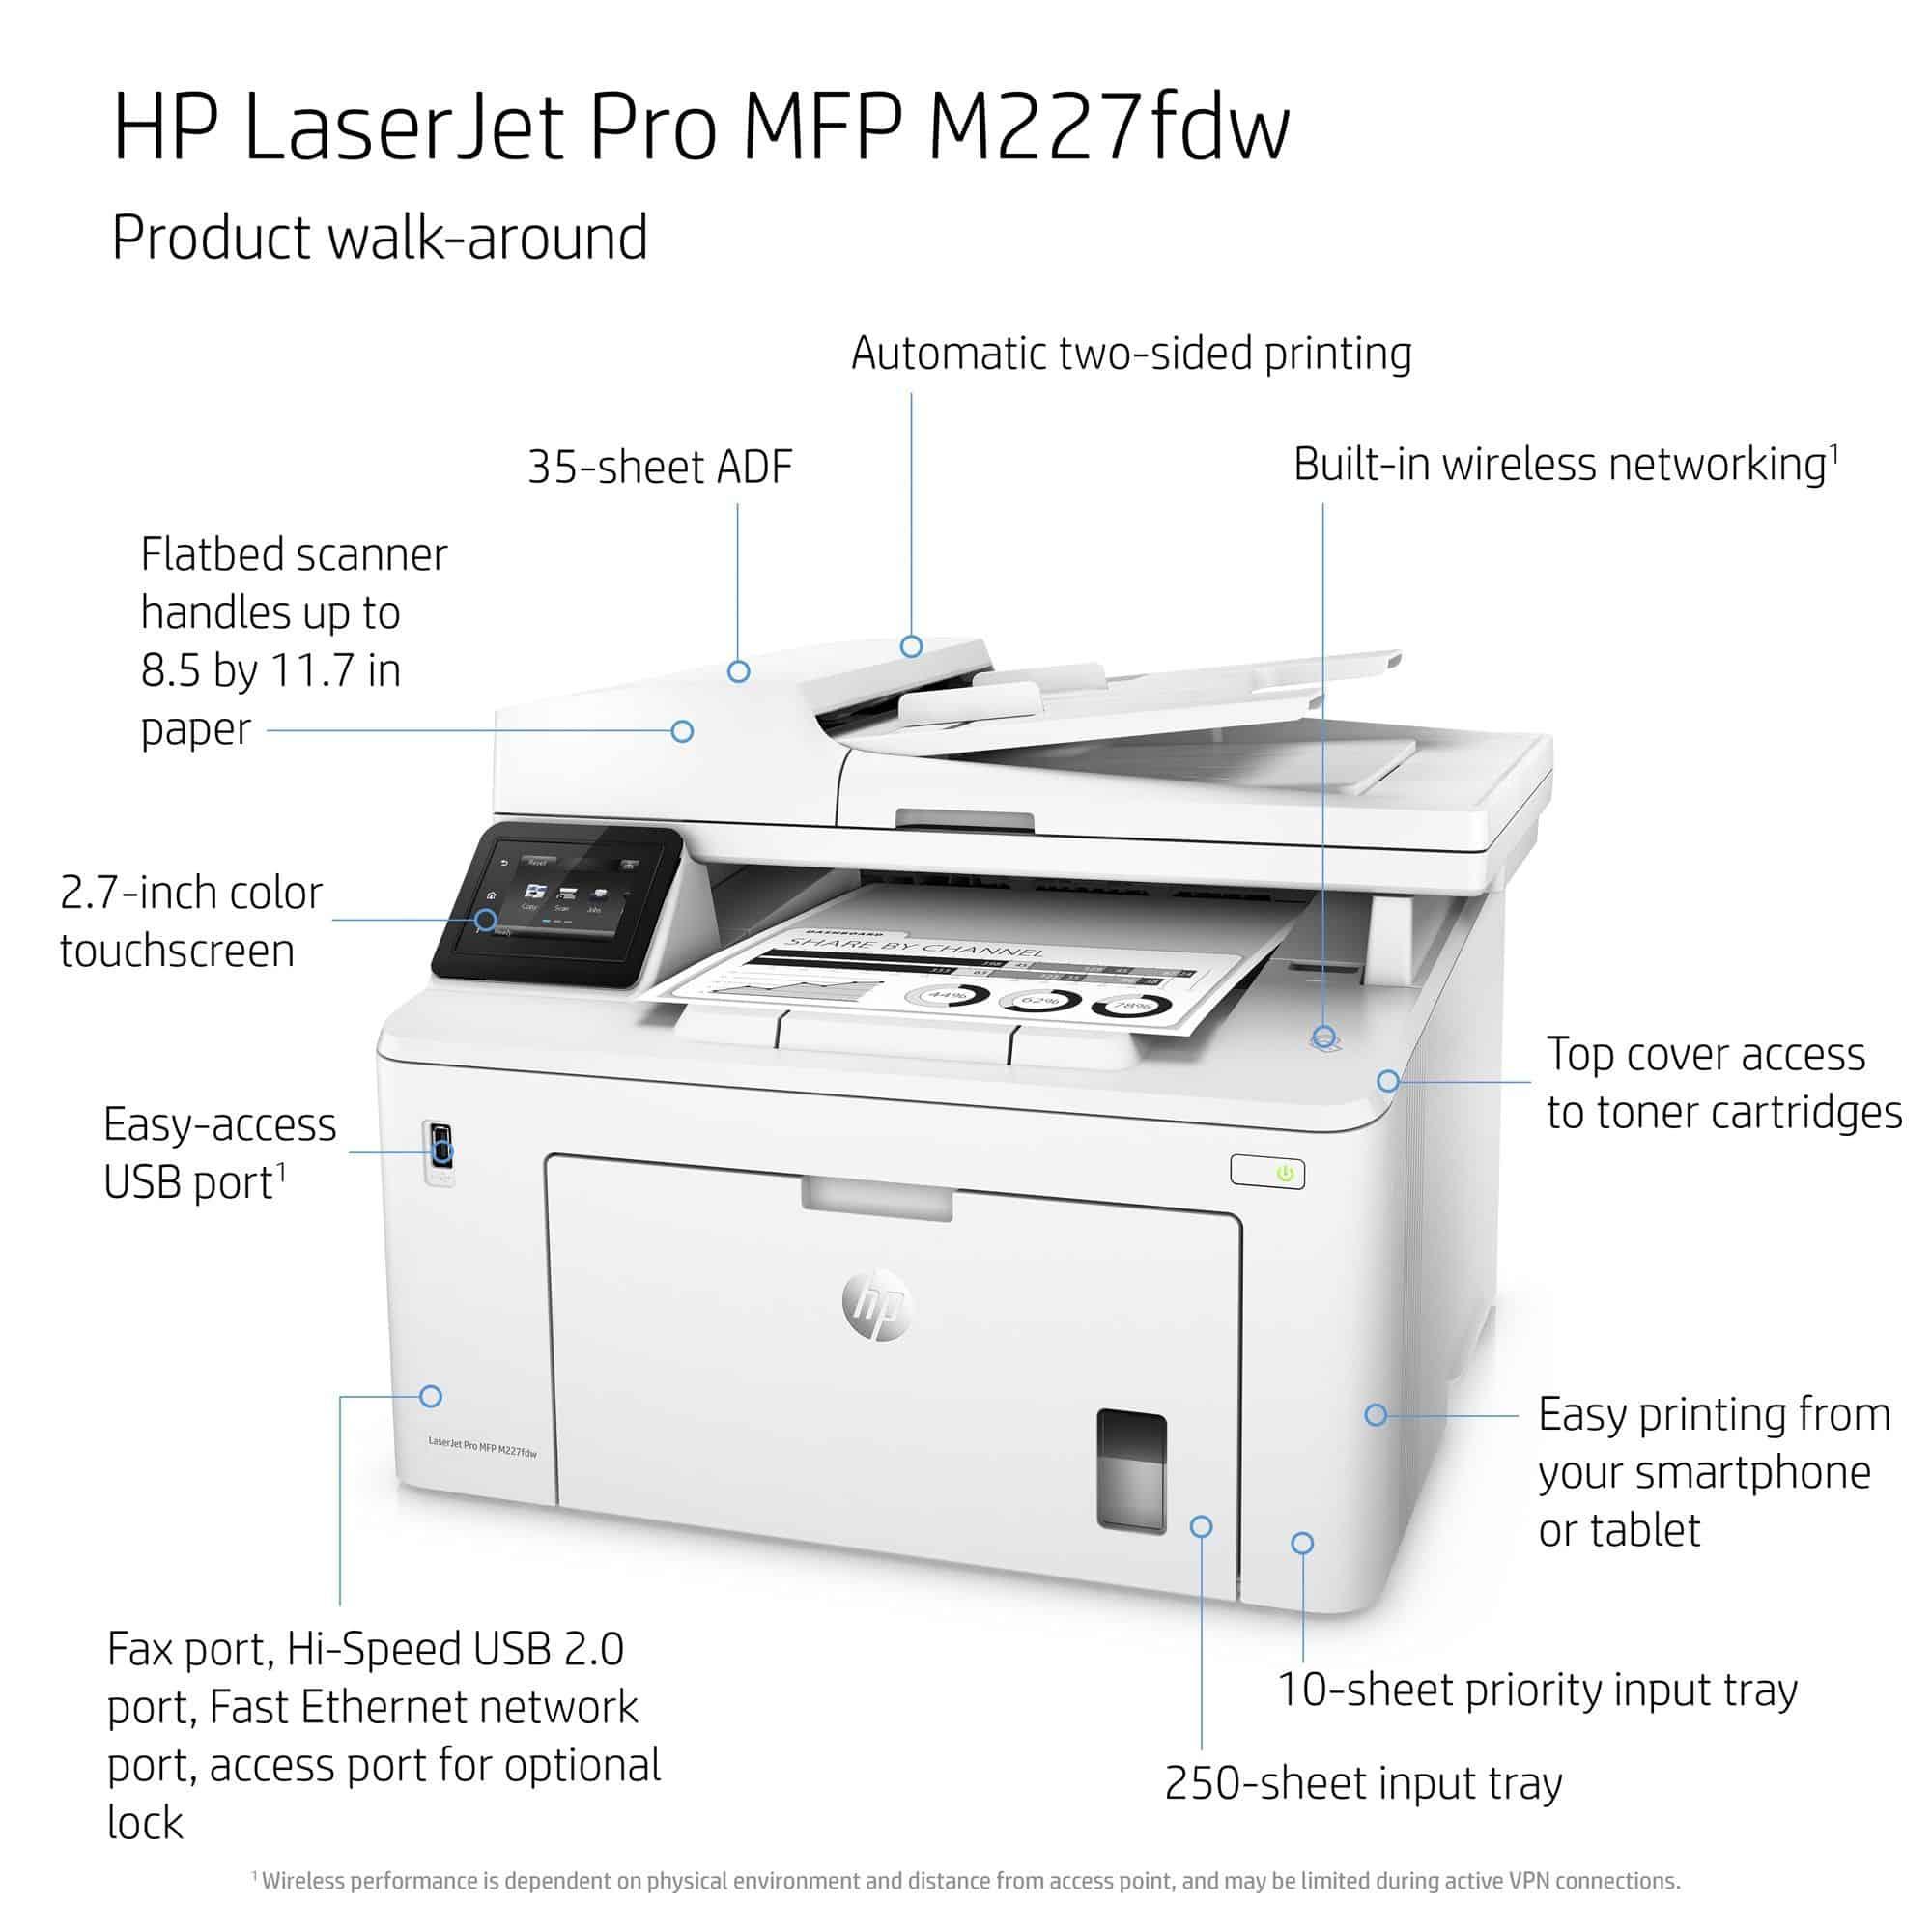 Biareview com - HP LaserJet Pro MFP M227fdw